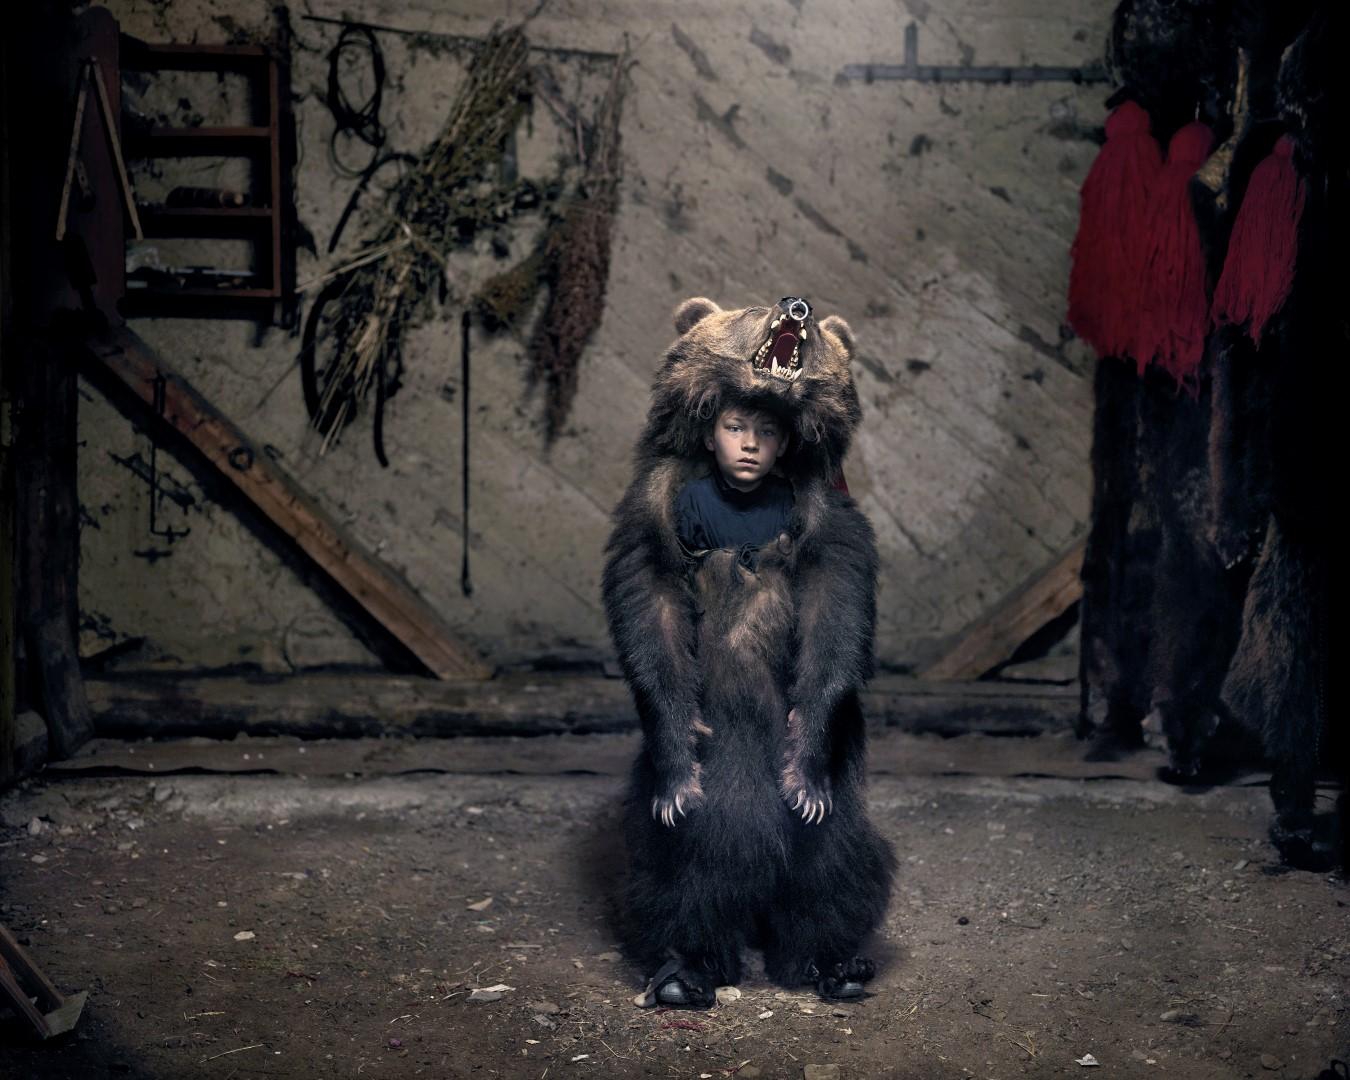 Fotó: Dezső Tamás, Ciprian a medvetáncos – Salatruc, Kelet-Románia I Ciprian, the Bear Dancer (Salatruc, East Romania), 2013 © Tamas Dezso